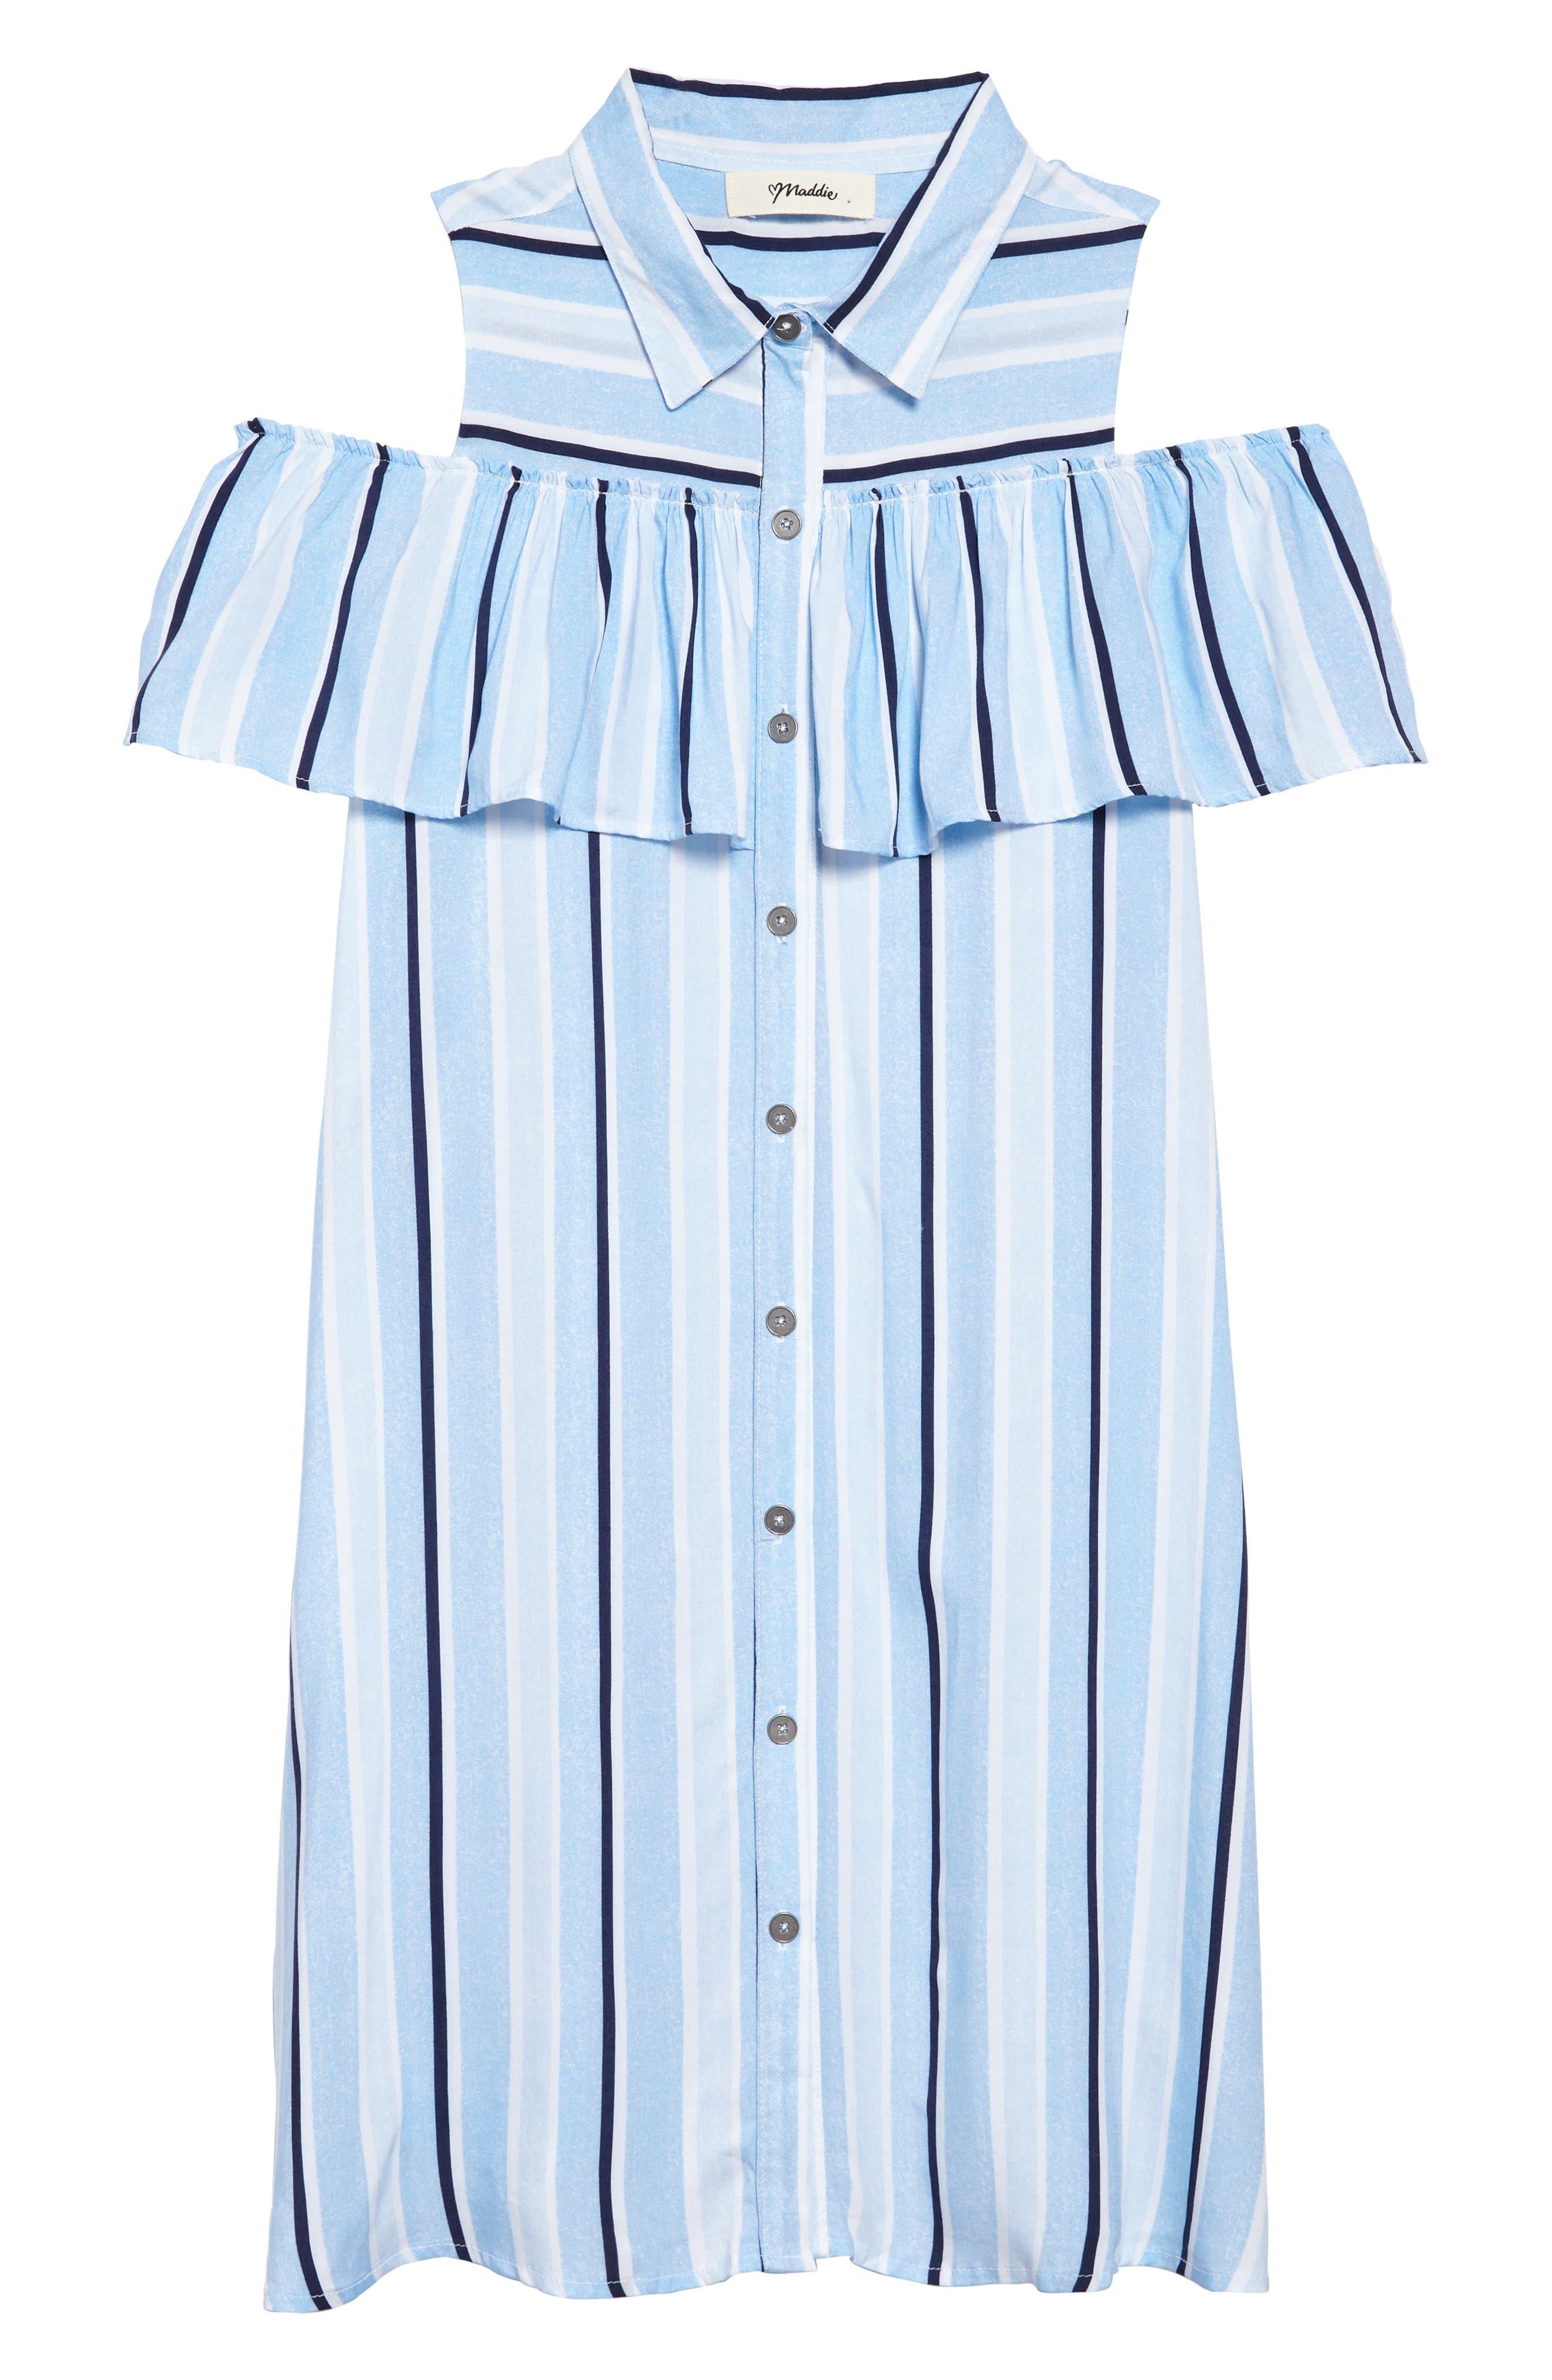 Cold Shoulder Knit Shirtdress,                             Main thumbnail 1, color,                             Light Blue/ White